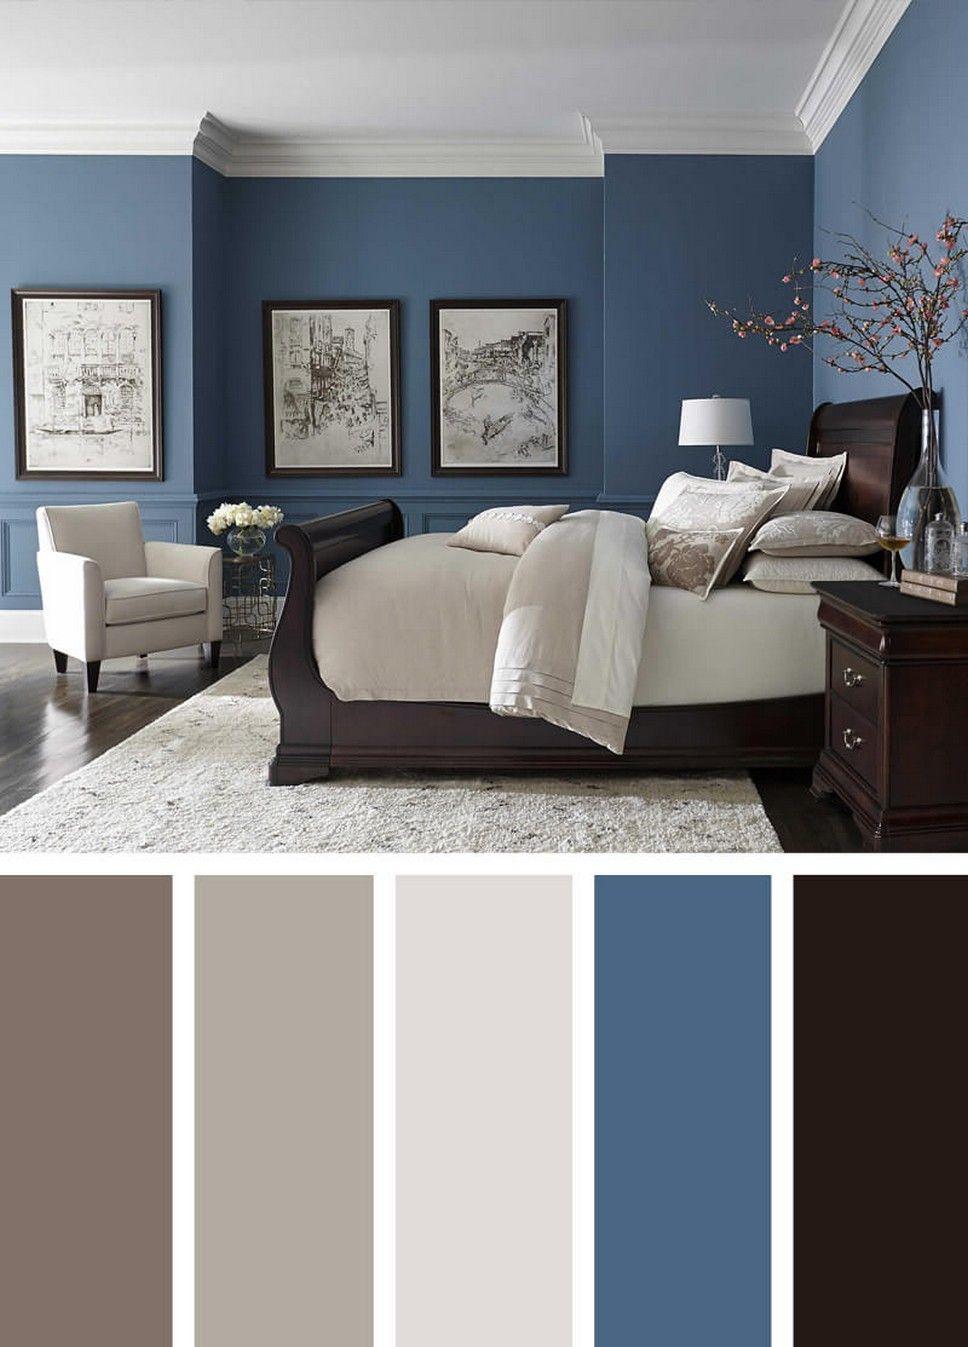 65 Beautiful Bedroom Color Schemes Ideas 1 Home Designs Bedroom Wall Colors Master Bedroom Colors Modern Master Bedroom Bedroom color ideas pictures